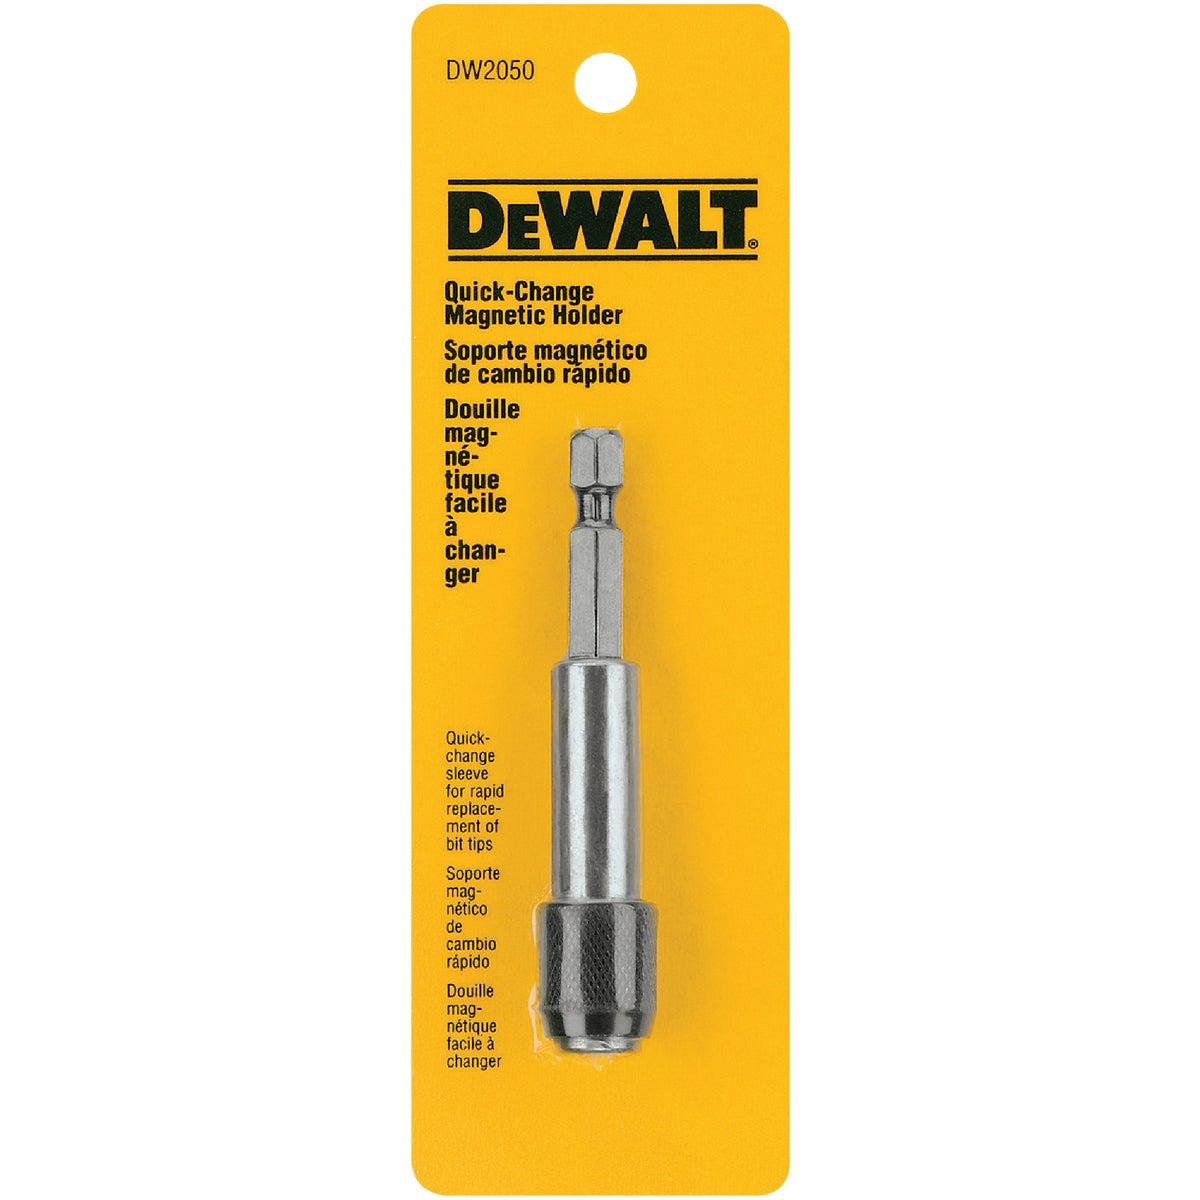 DeWalt Quick Change Magnetic Bit Holder, DW2050